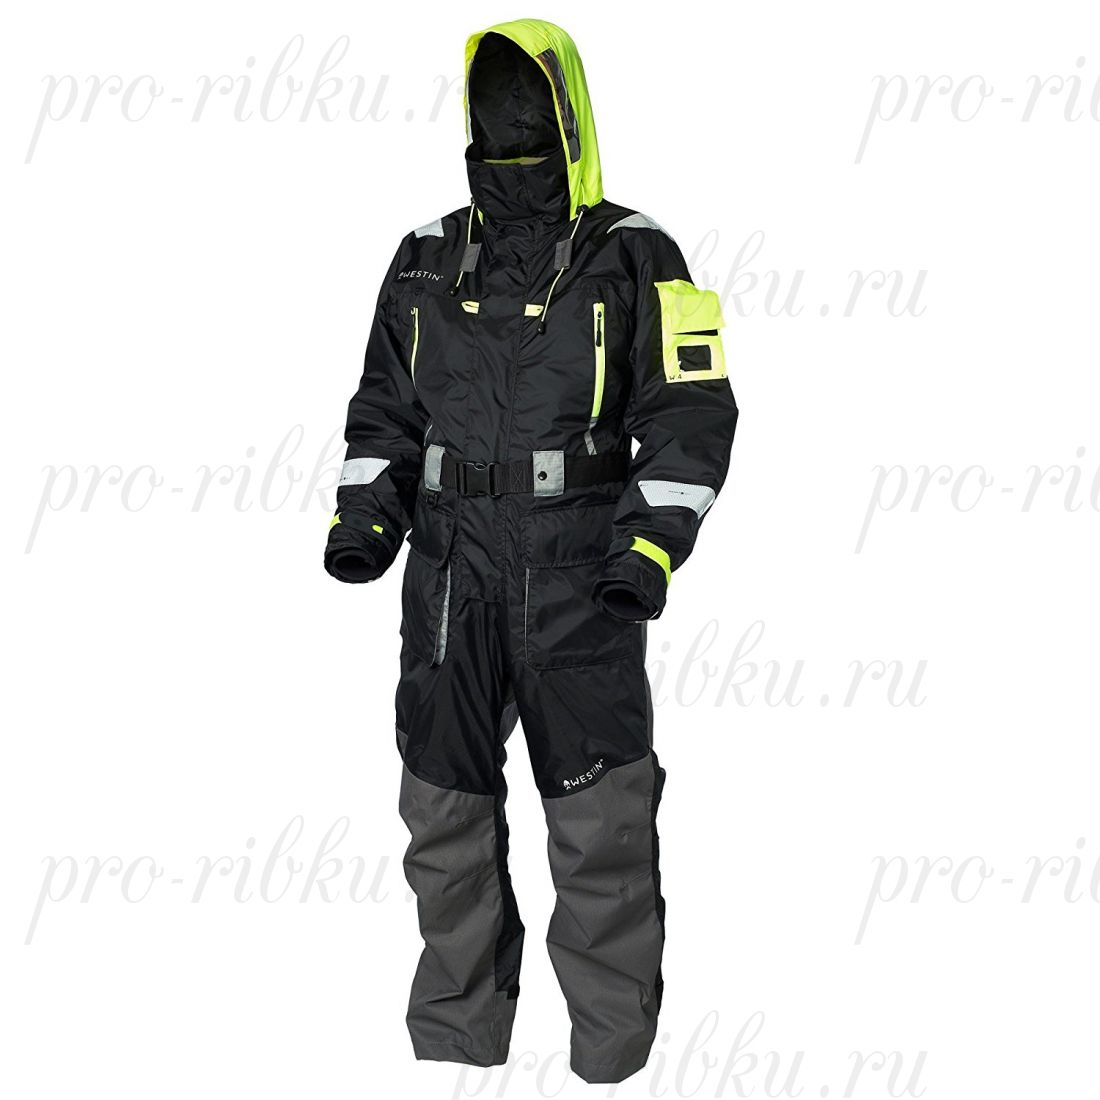 Костюм Westin W4 Flotation Suit Jetset Lime размер XL